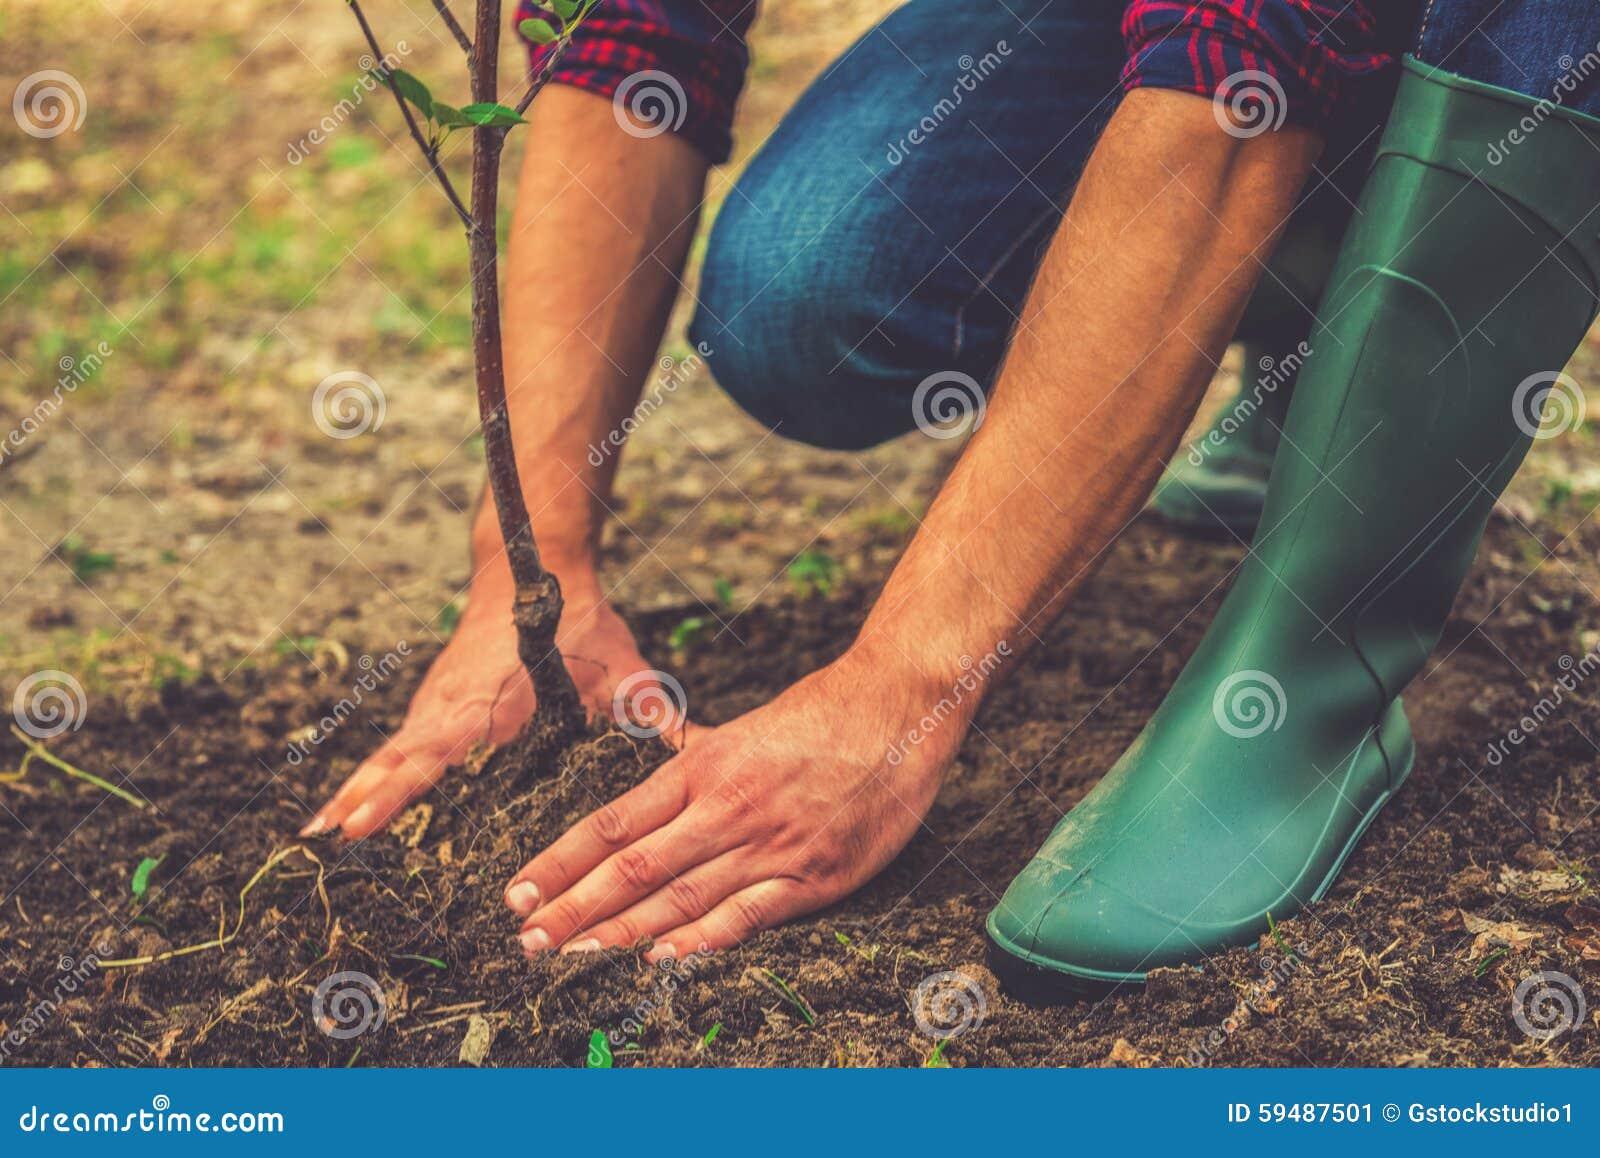 Planting a tree.